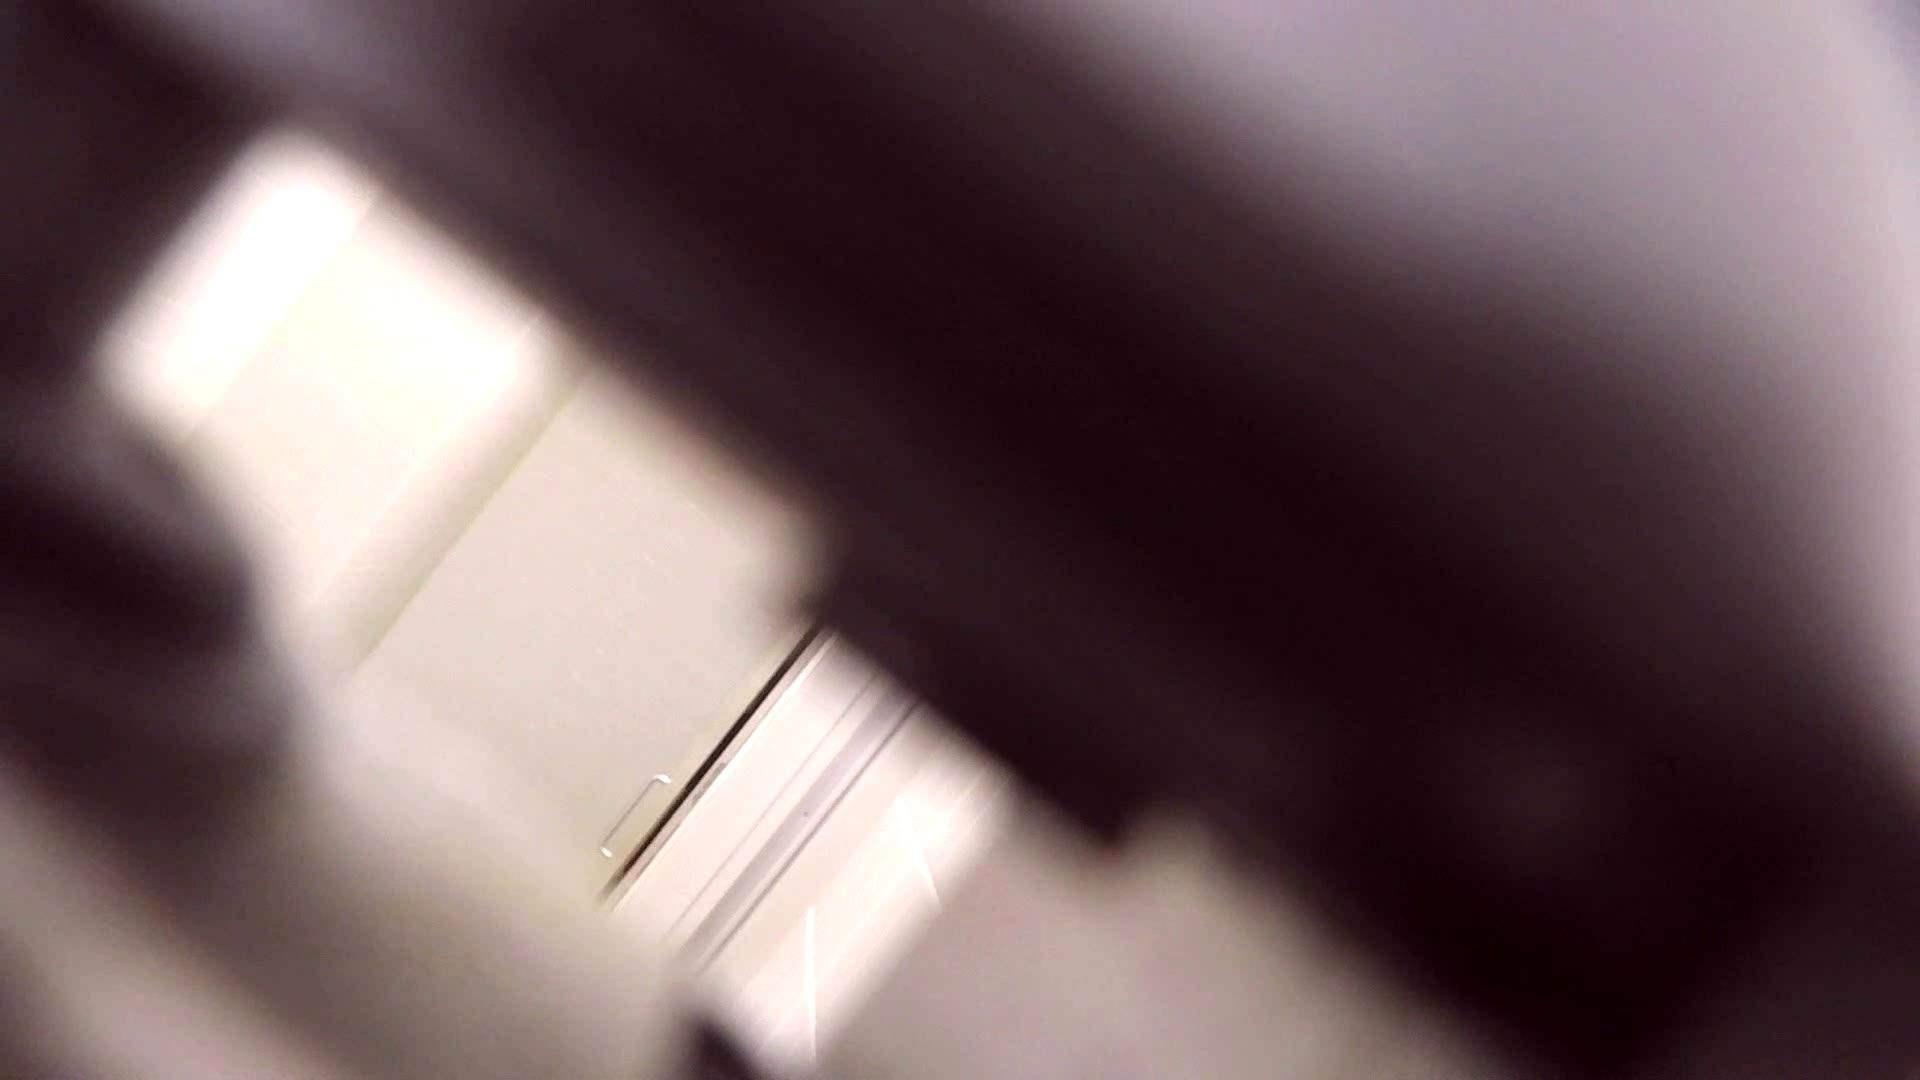 vol.17 命がけ潜伏洗面所! 張り裂けんばかりの大物 潜入突撃 セックス画像 88pic 54